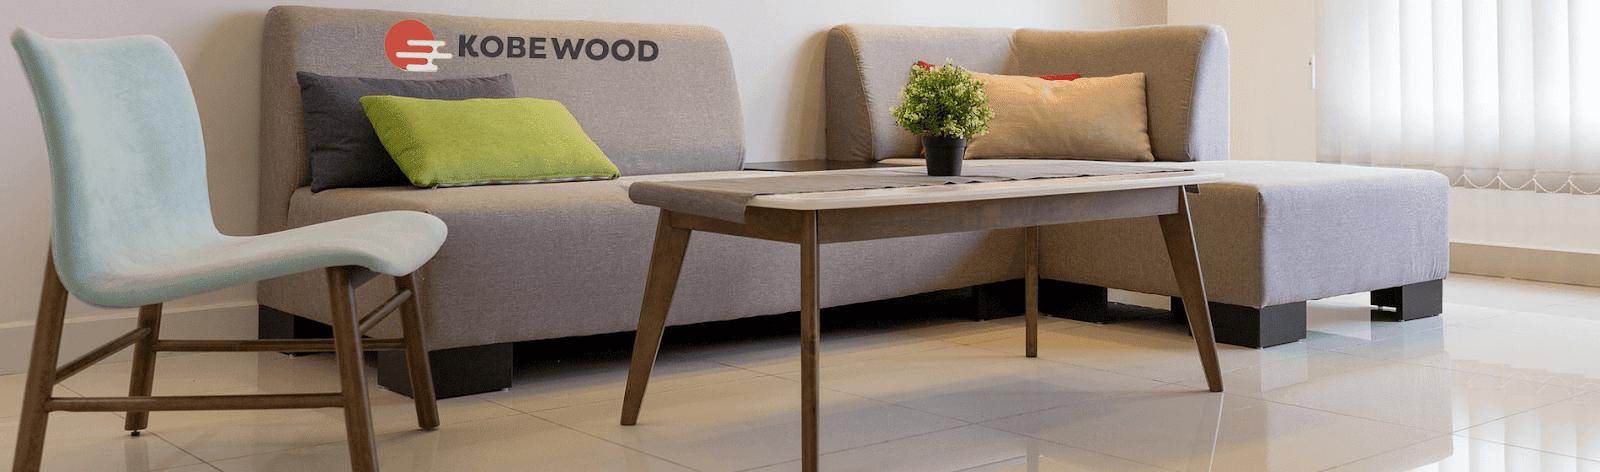 đồ gỗ nội thất kobewood